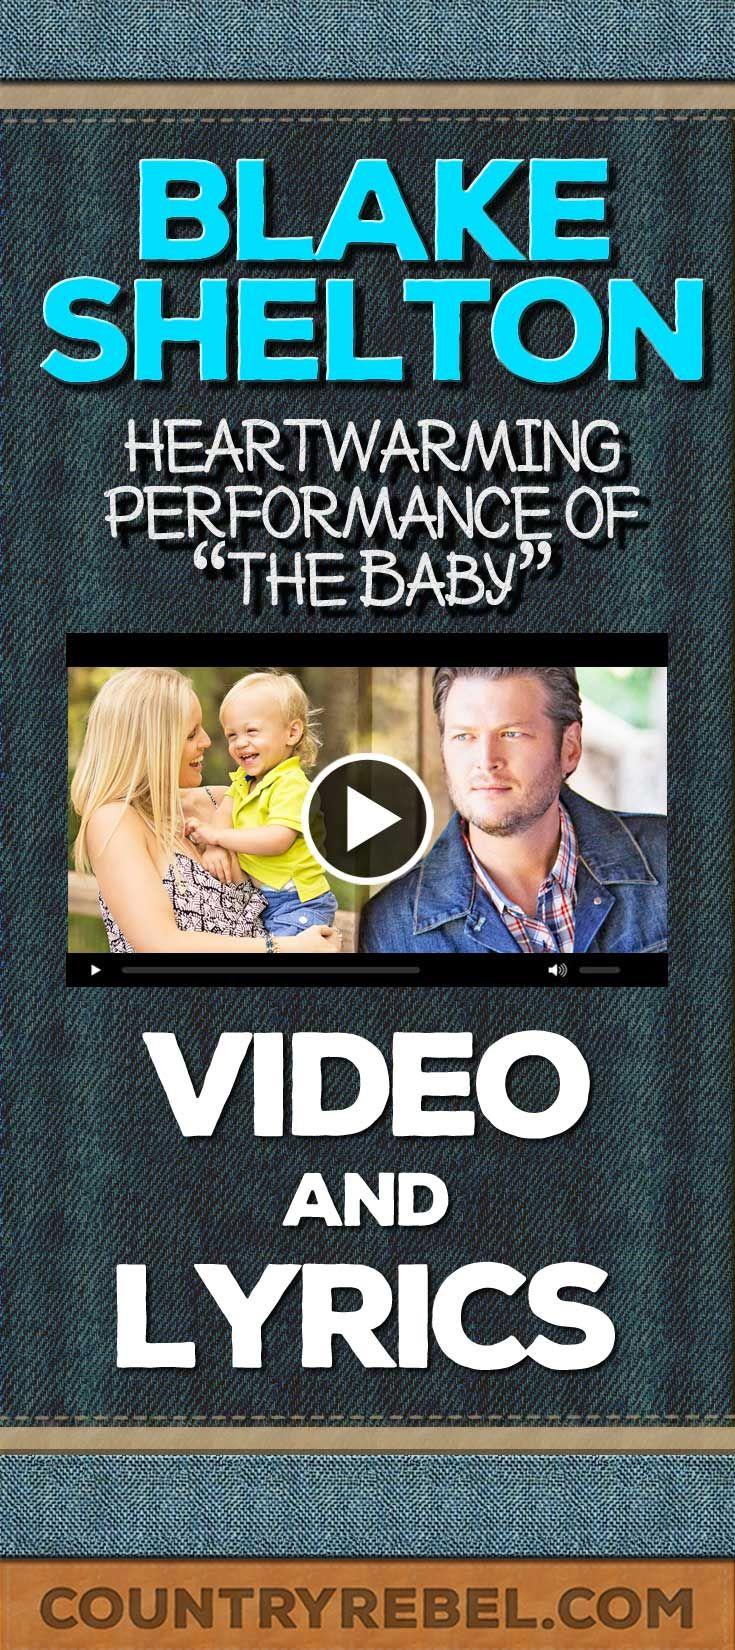 Blake Sheltons Heartwarming Performance Of  The Baby